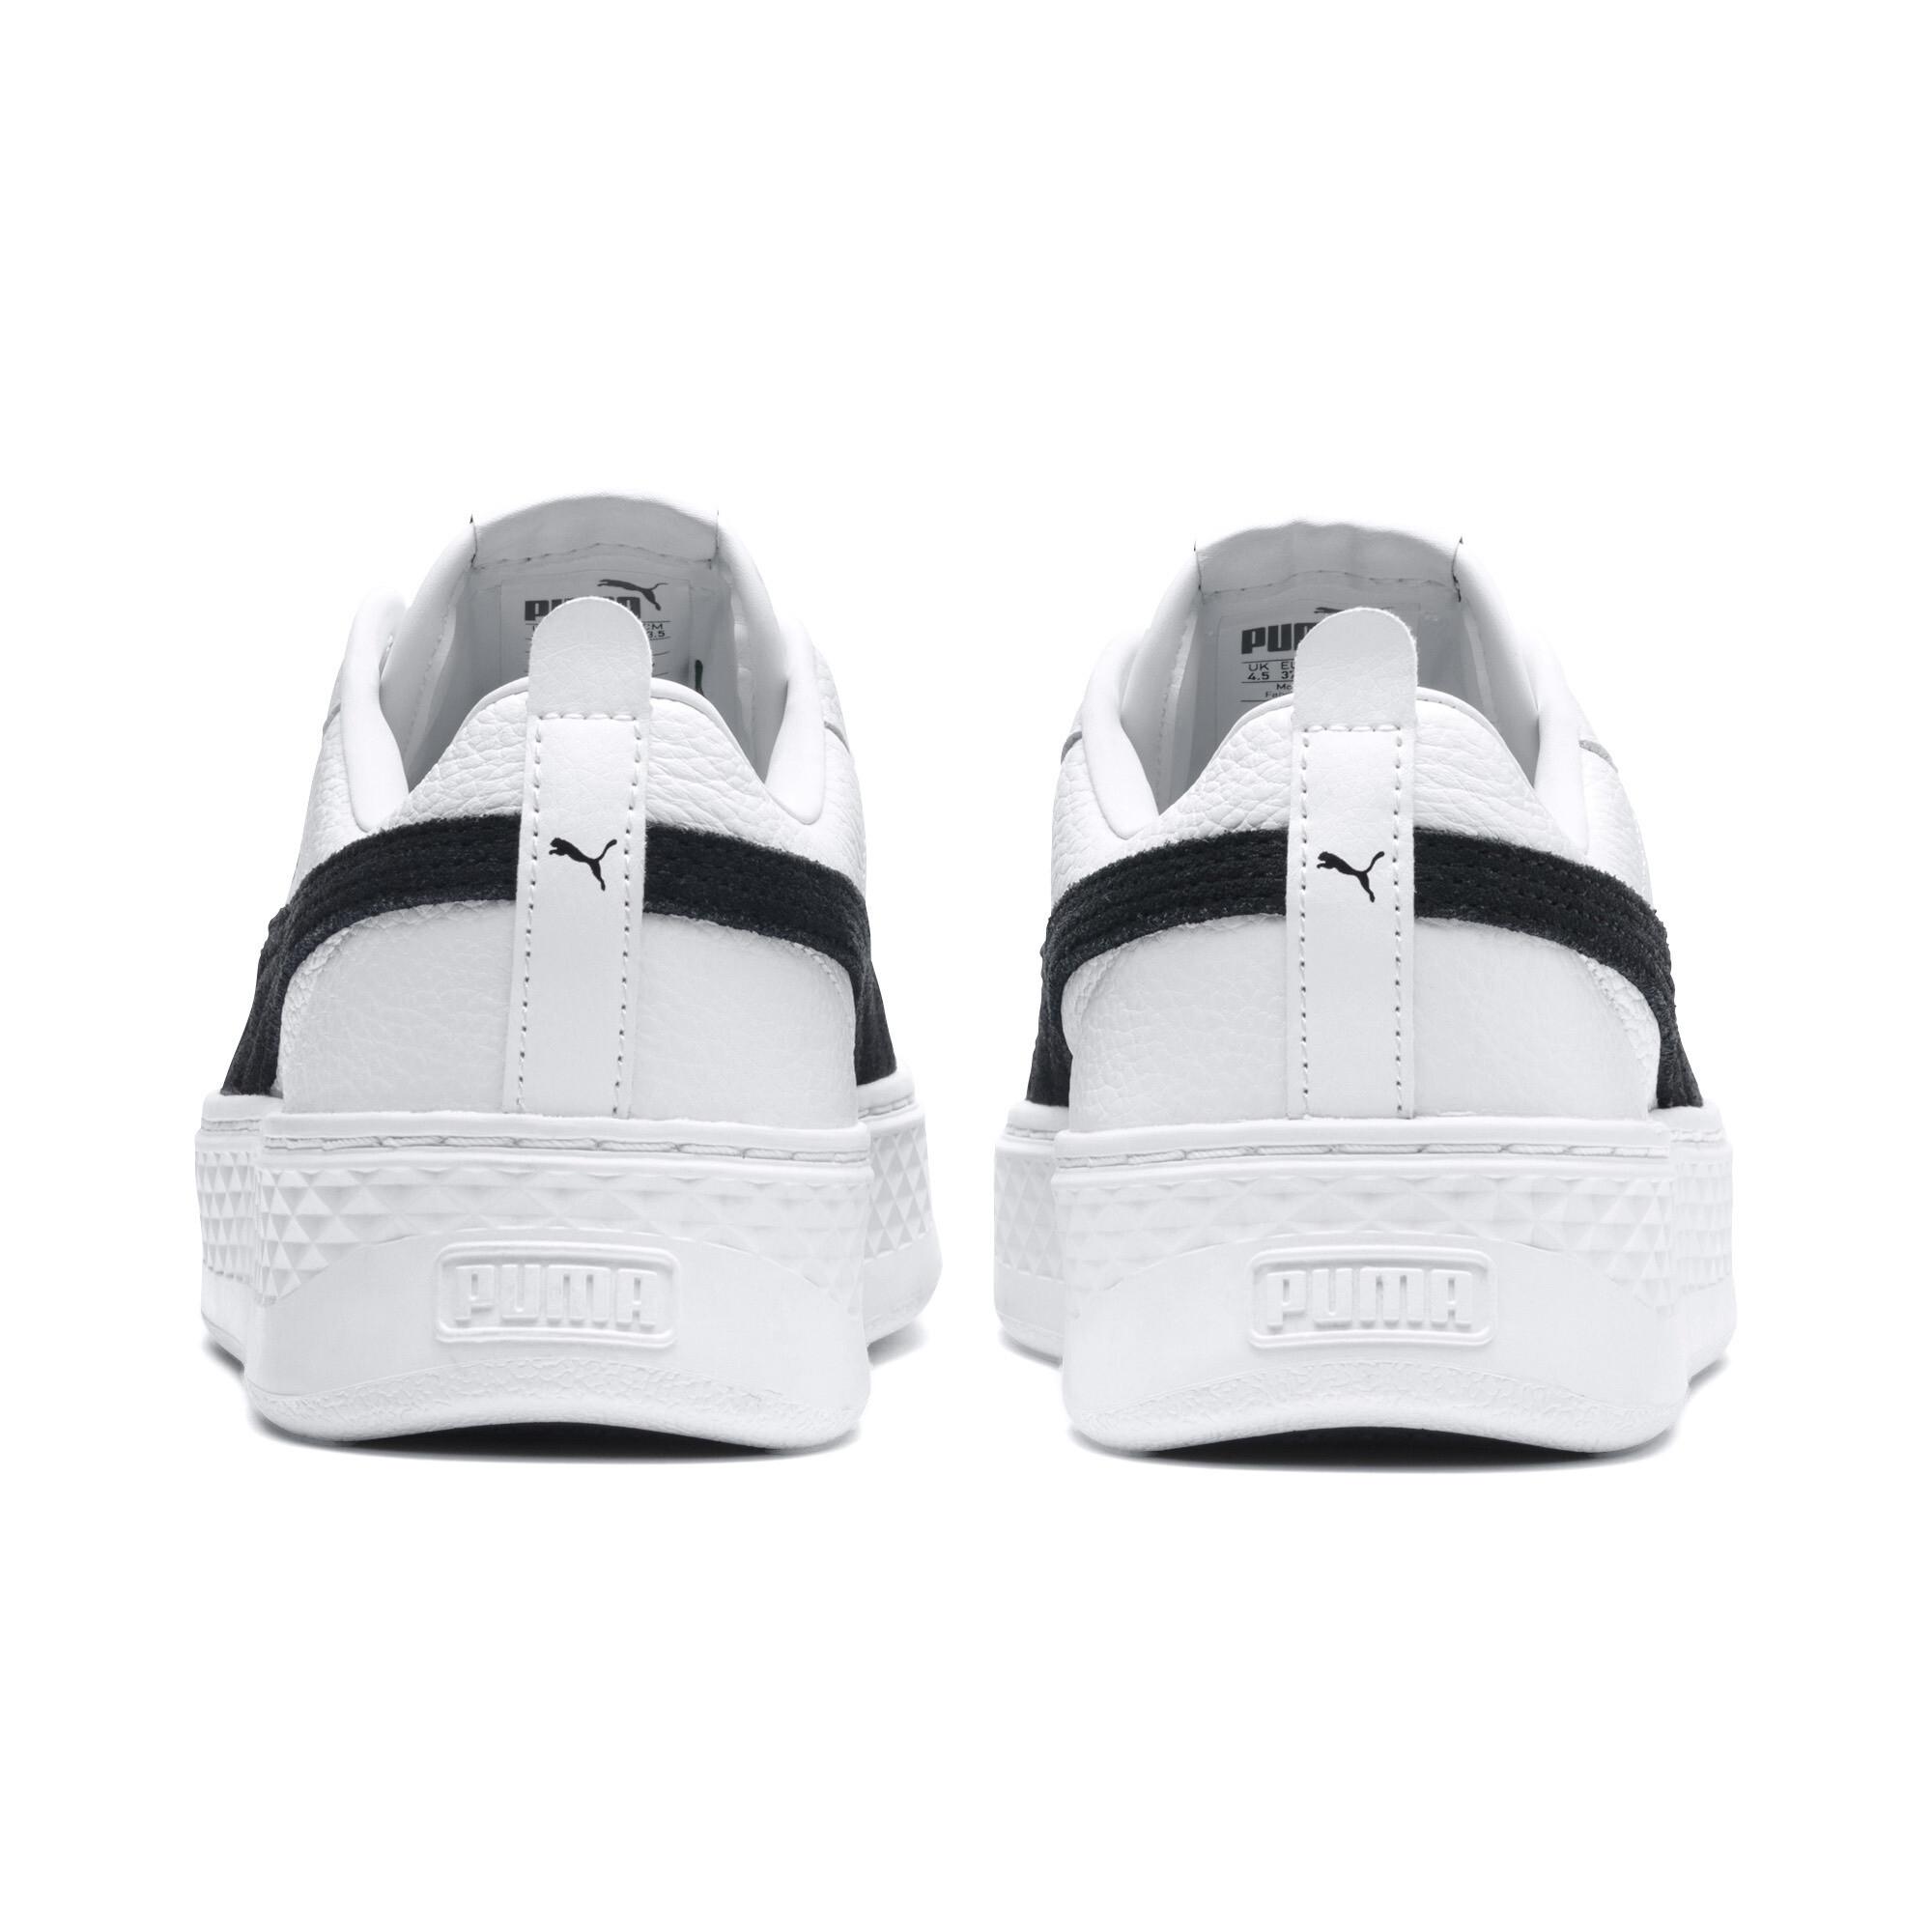 PUMA-Smash-Platform-Leather-Women-039-s-Sneakers-Women-Shoe-Basics thumbnail 13